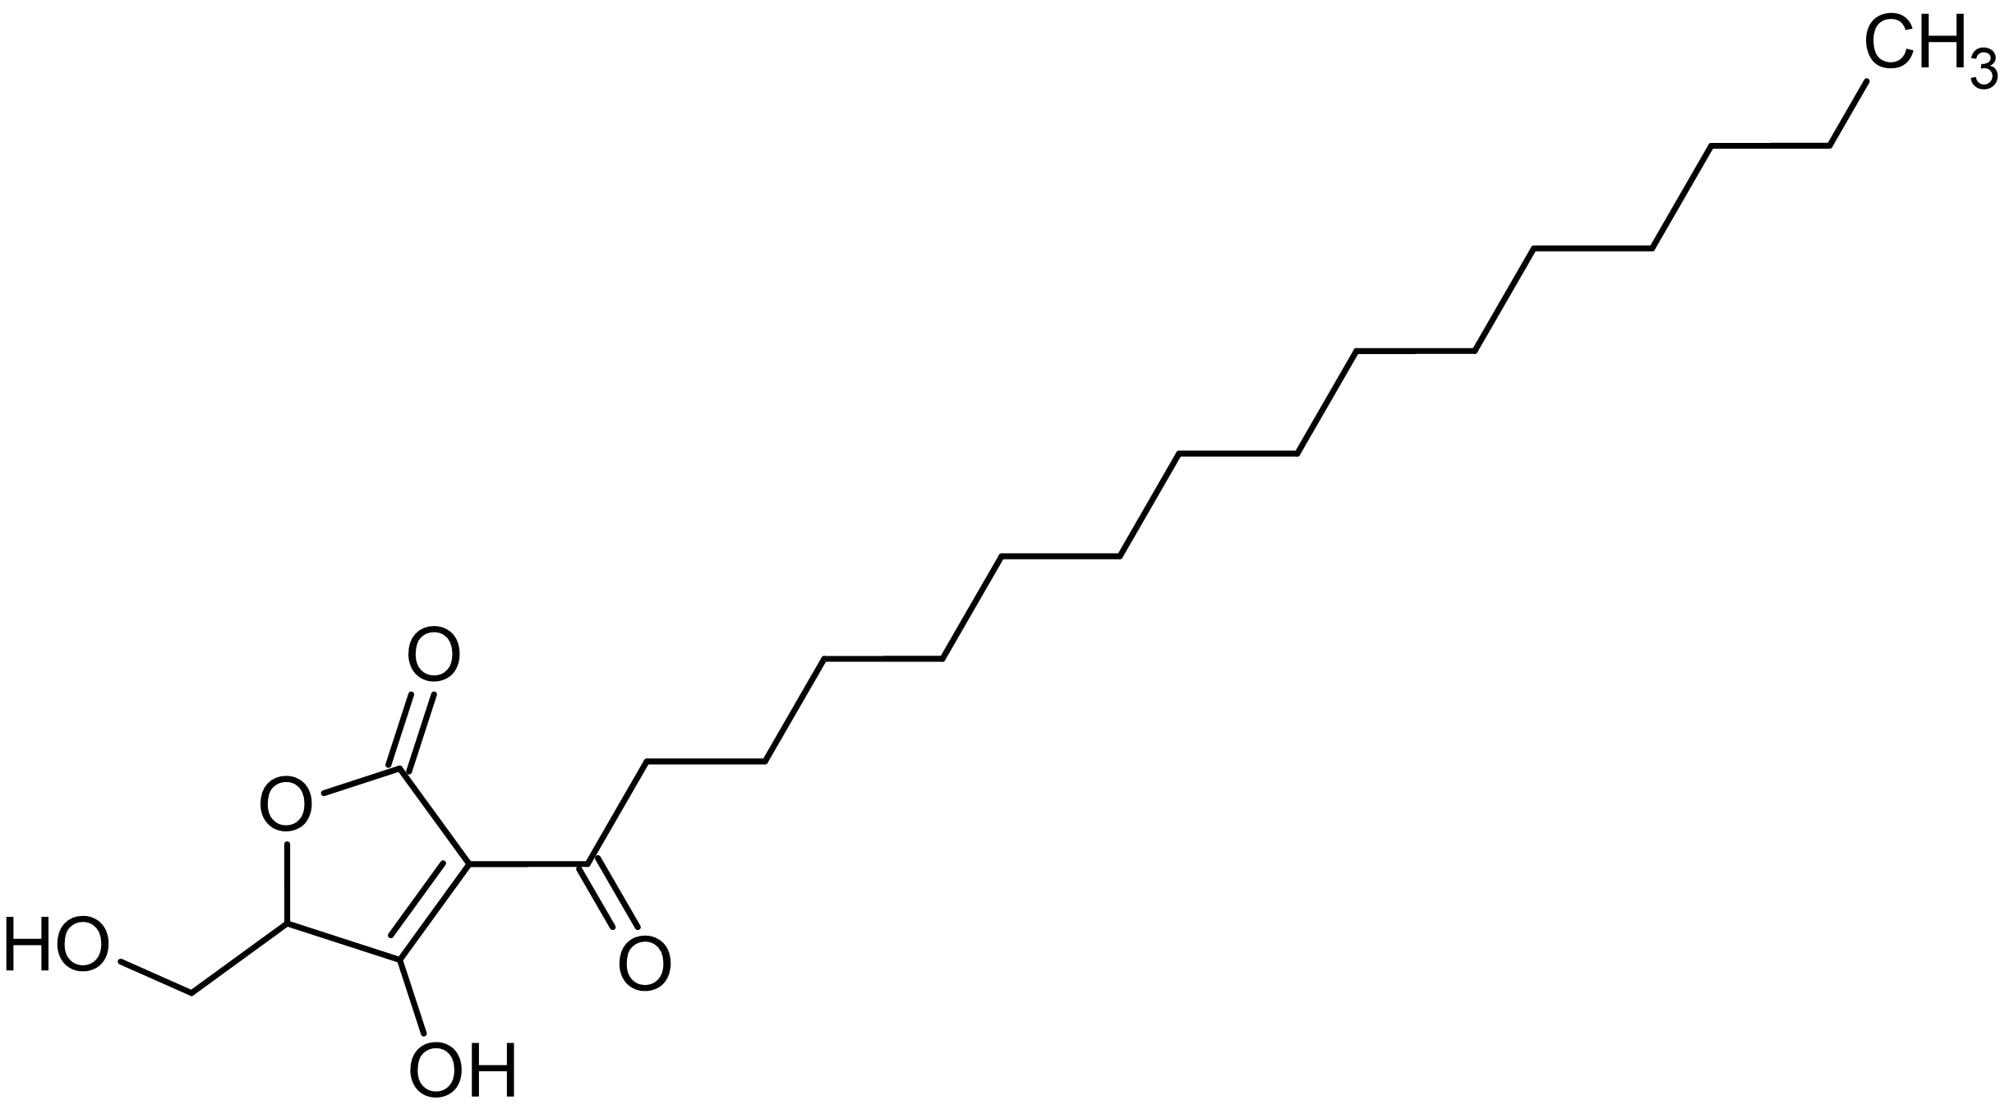 Chemical Structure - RK-682, protein tyrosine phosphatase (PTP) inhibitor (ab141730)